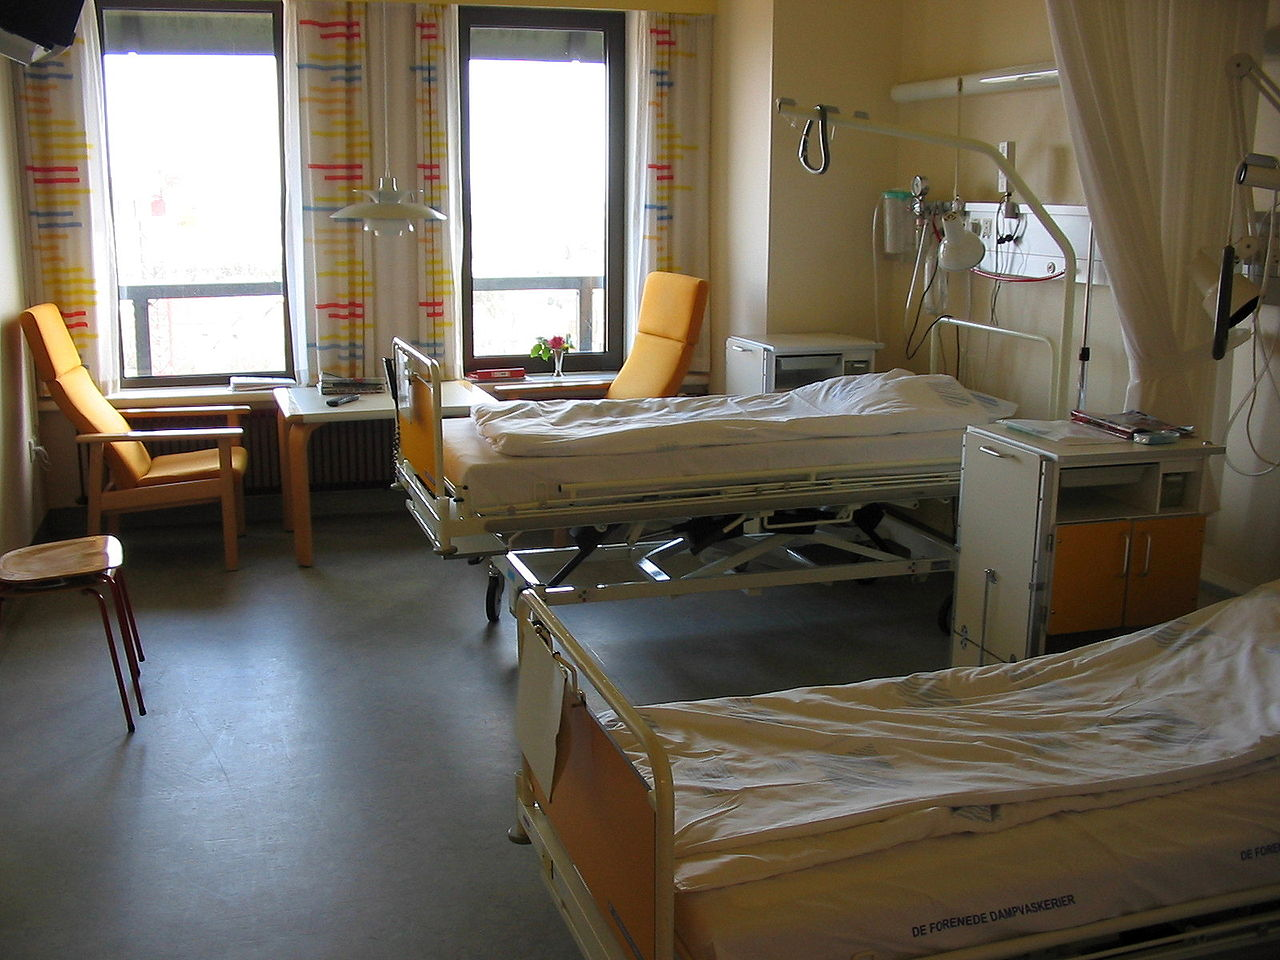 2016-11-14-hospital_room_ubt